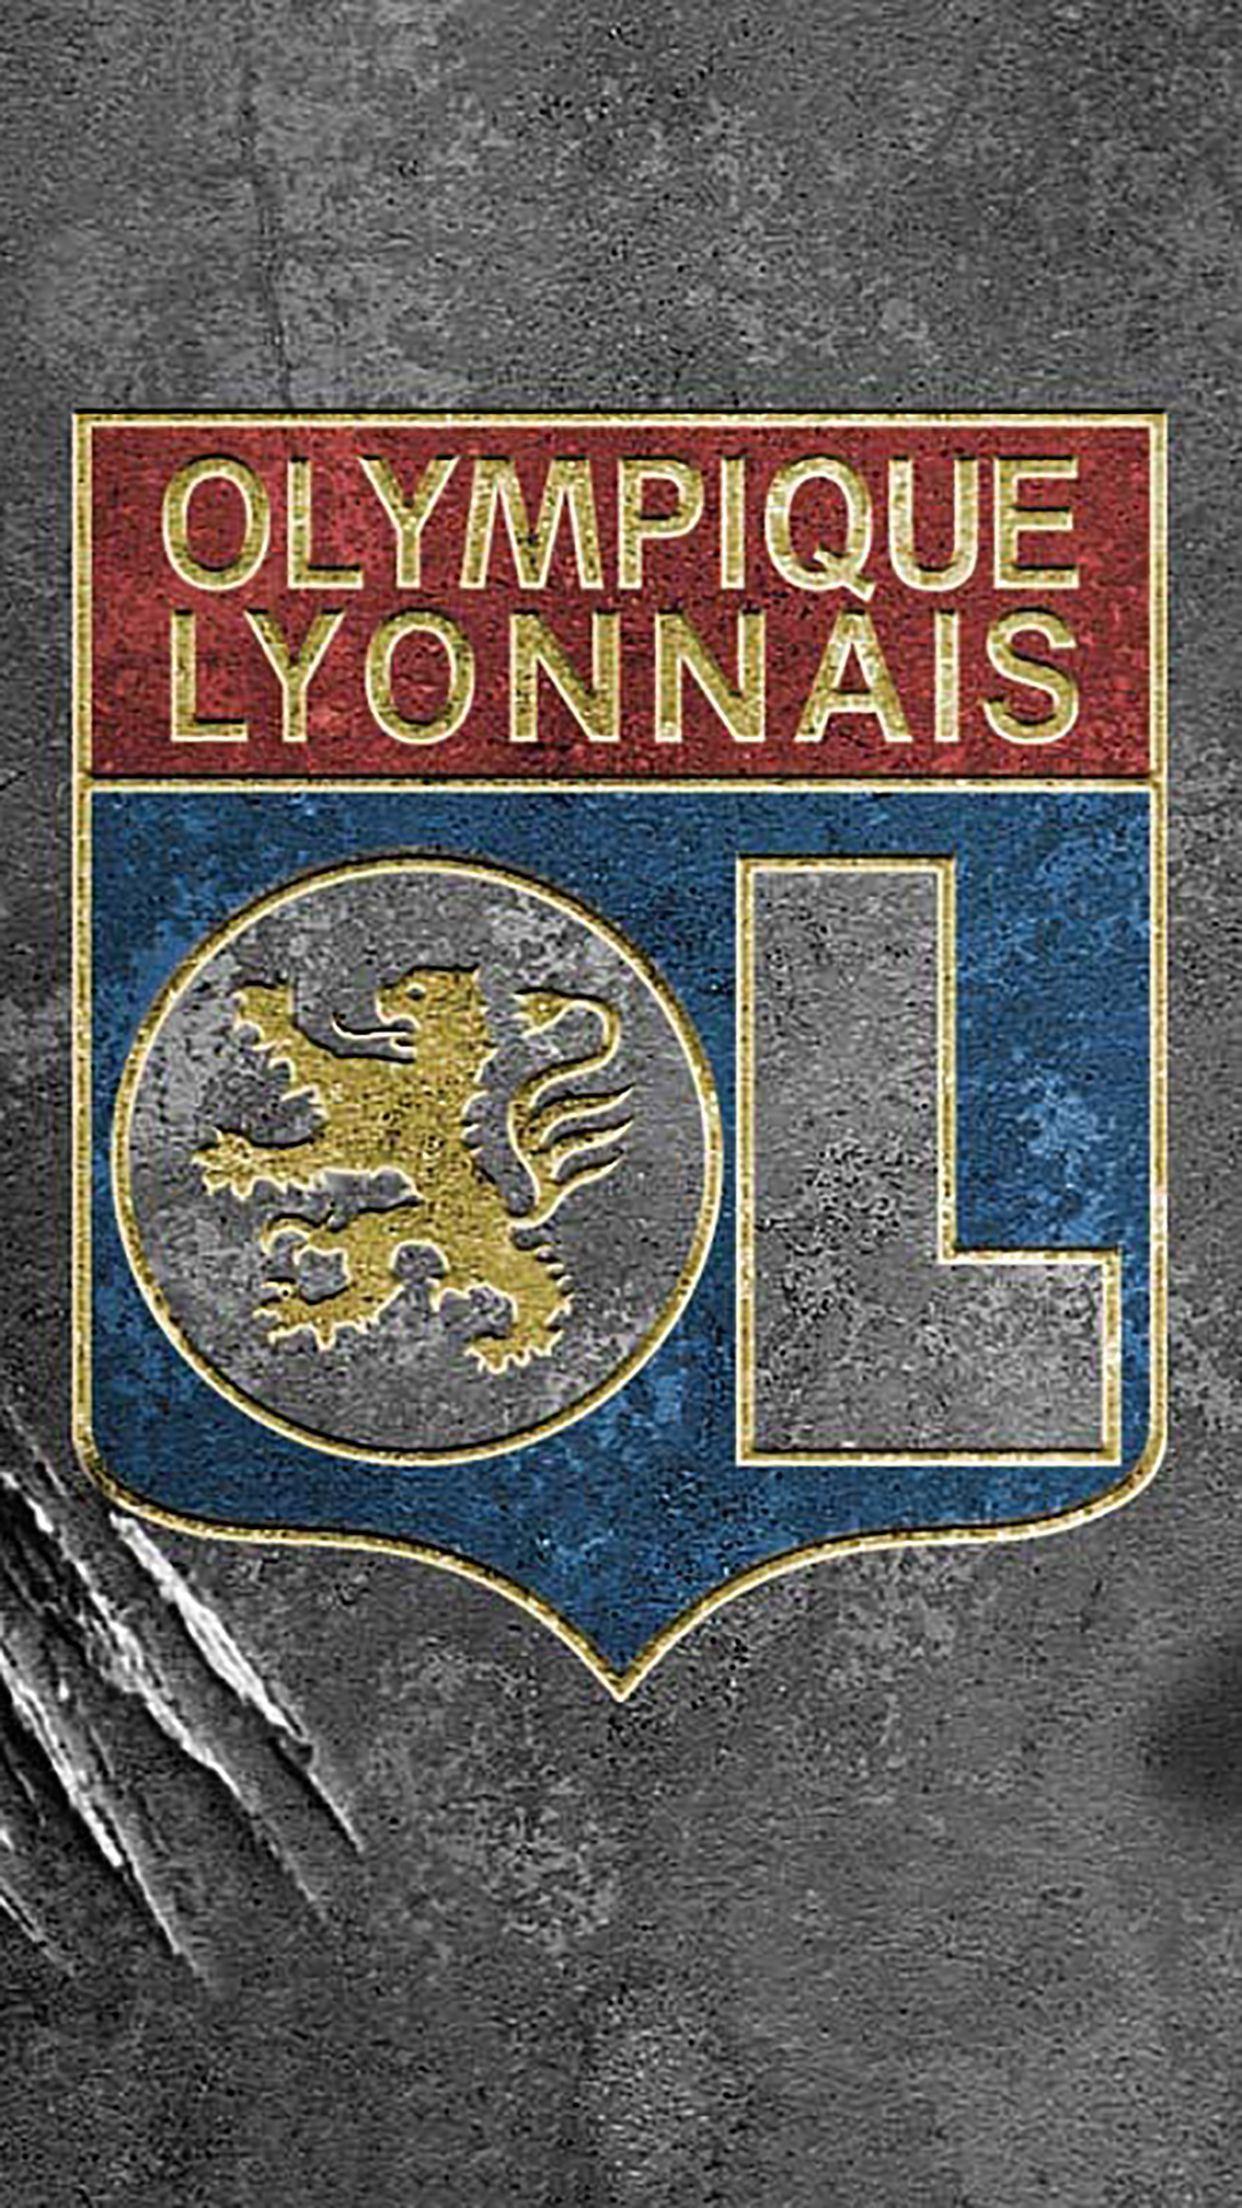 olympique lyonnais wallpapers